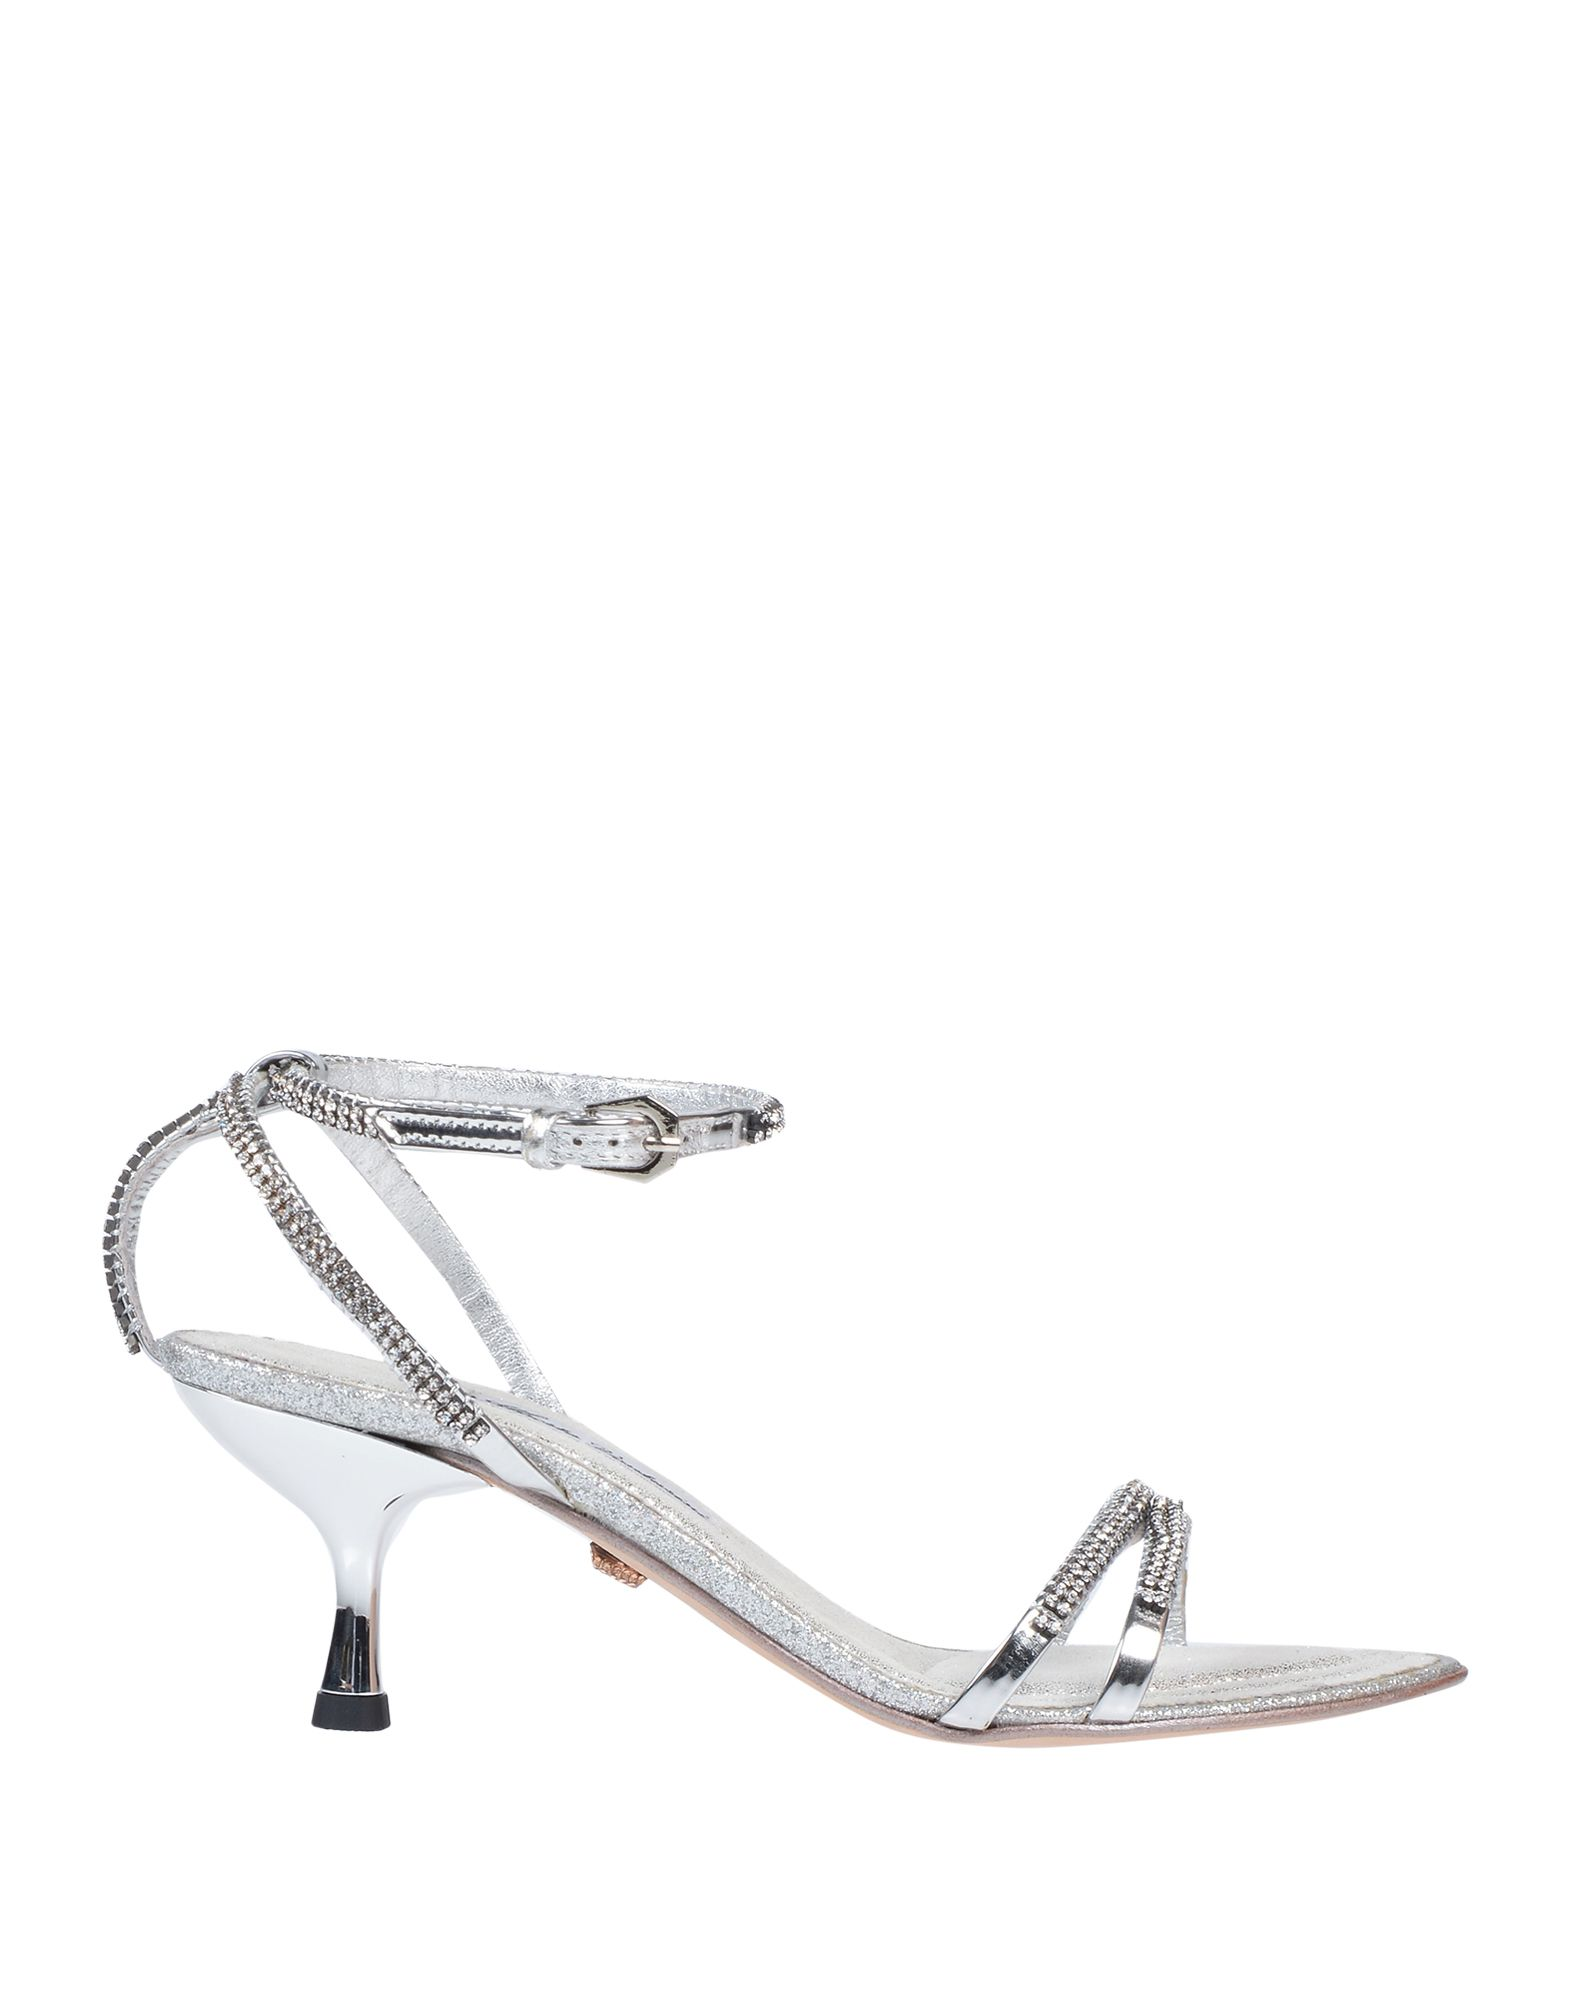 Alberto Alberto Venturini Sandals - Women Alberto Alberto Venturini Sandals online on  United Kingdom - 11509702OG a0c7ba